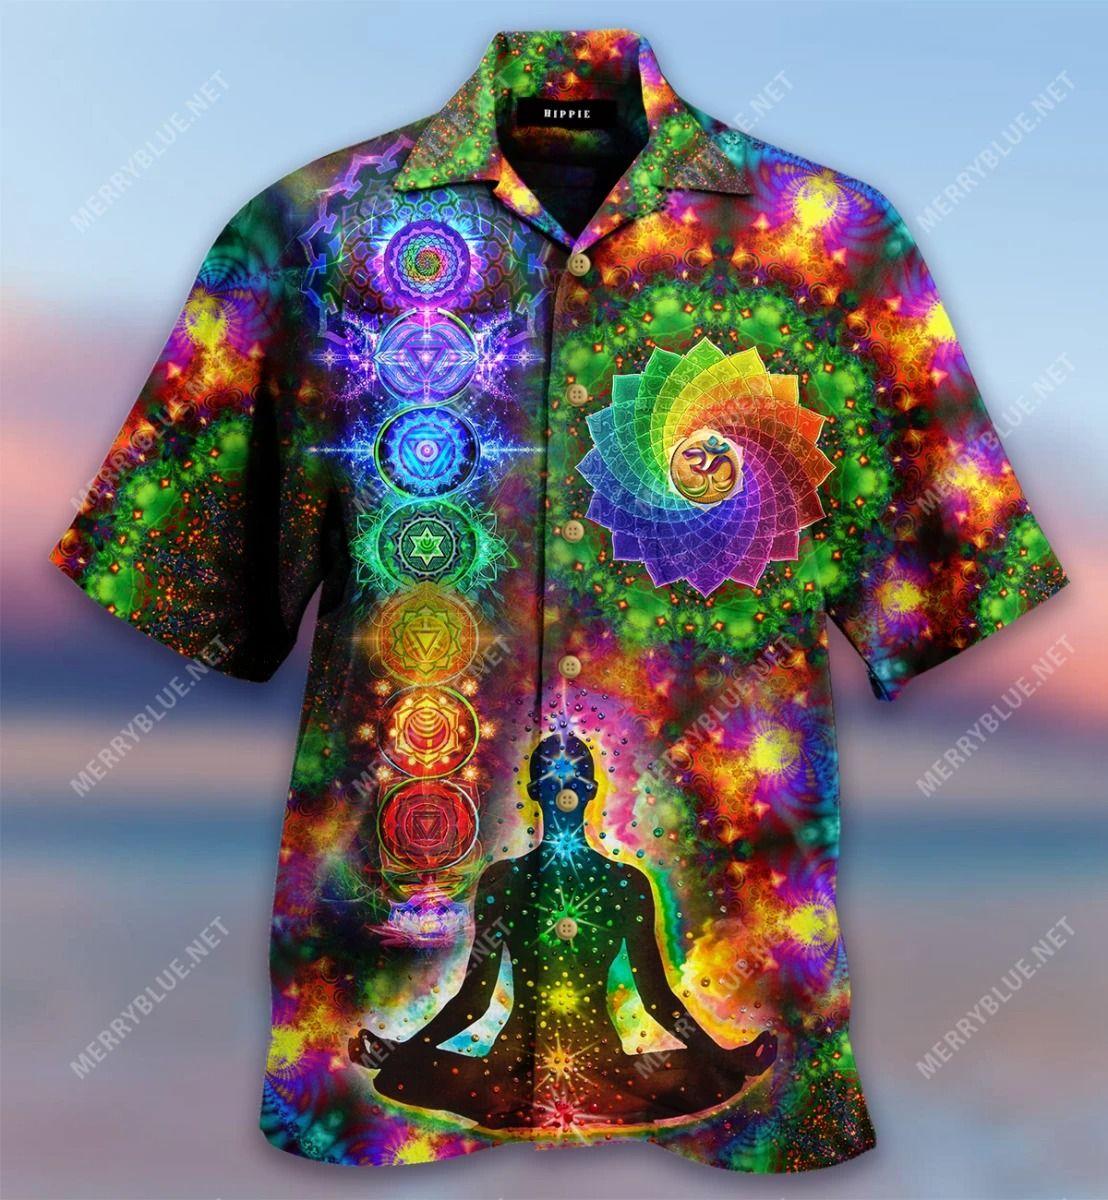 Om Namah Shivay Hawaiian Shirt